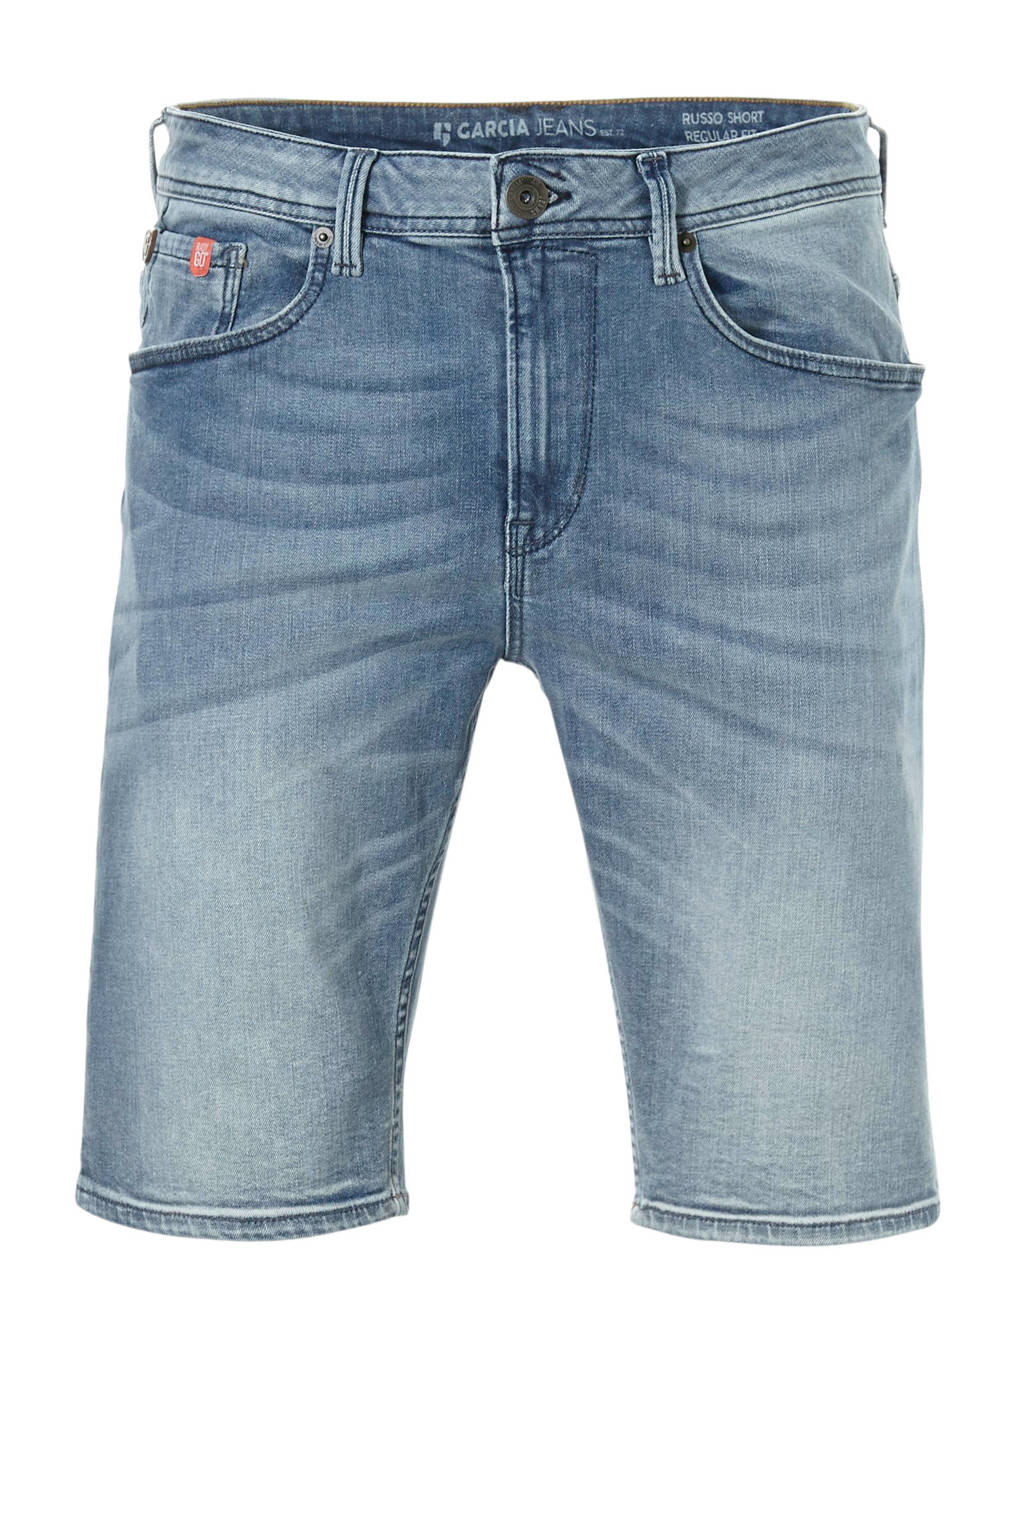 Jeans Regular Short Fit Garcia 15uT3FKJcl